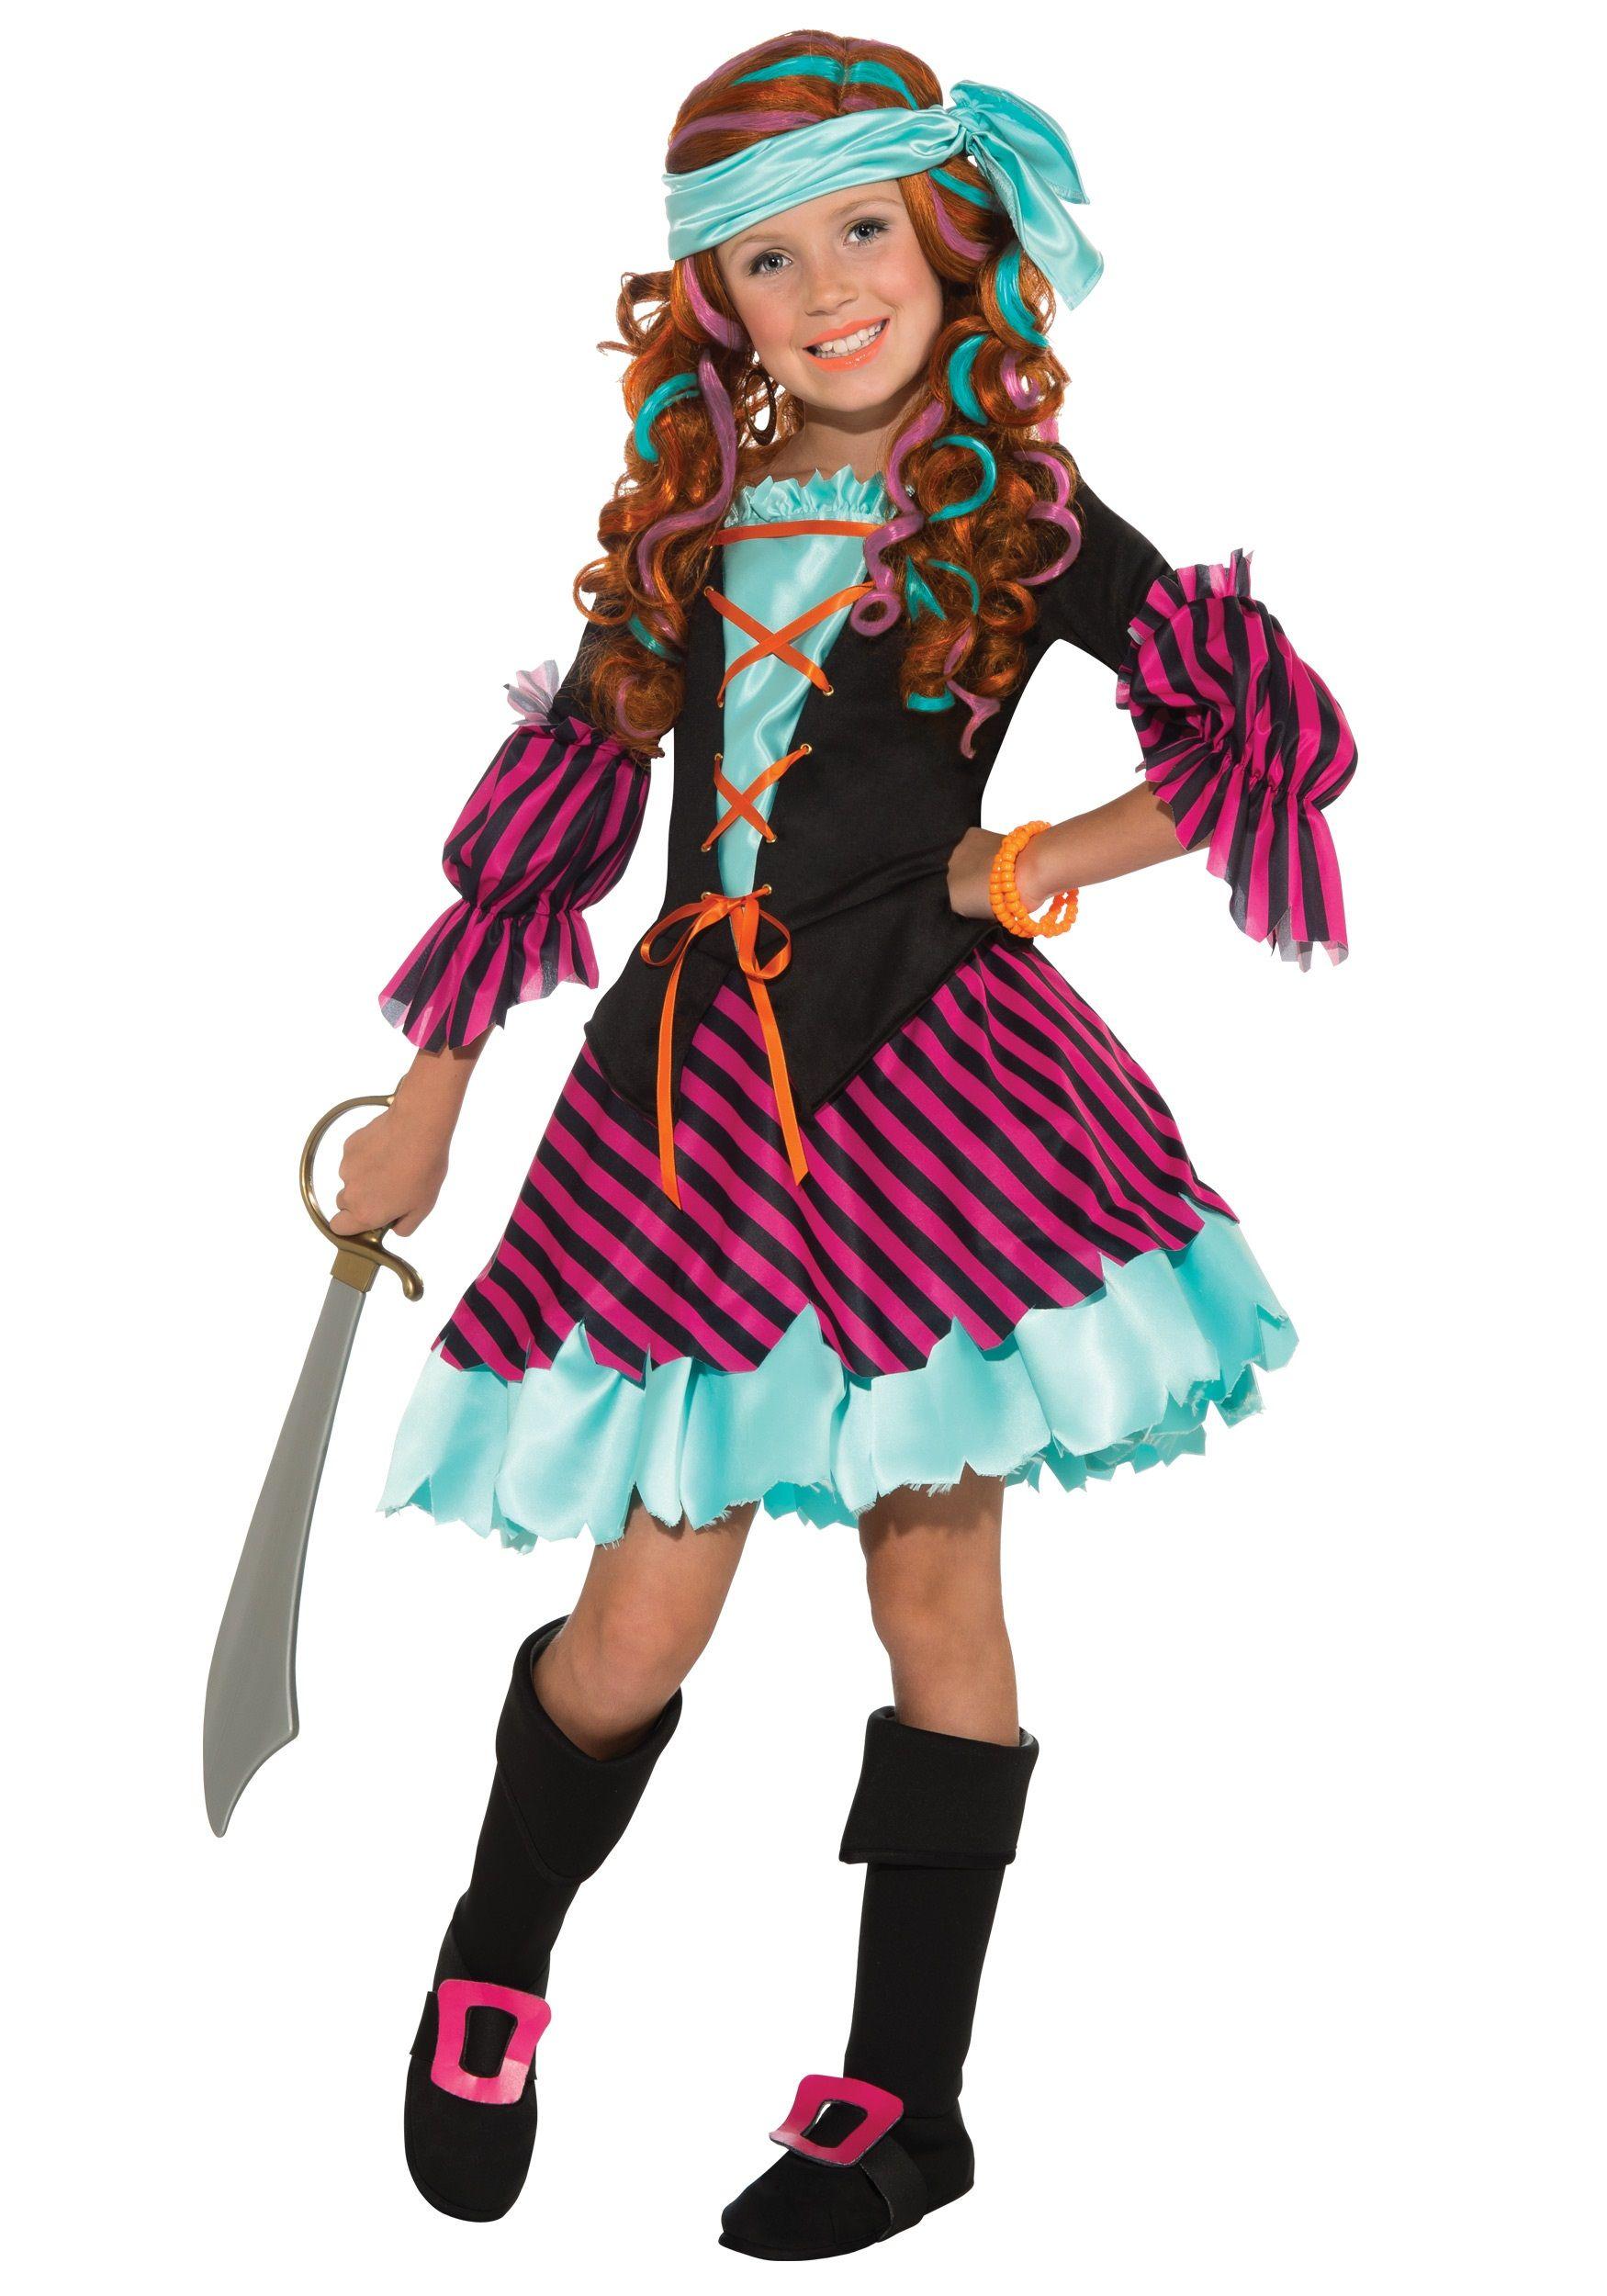 Salty Taffy Girls Pirate Costume | Girl pirate costumes, Girl ...